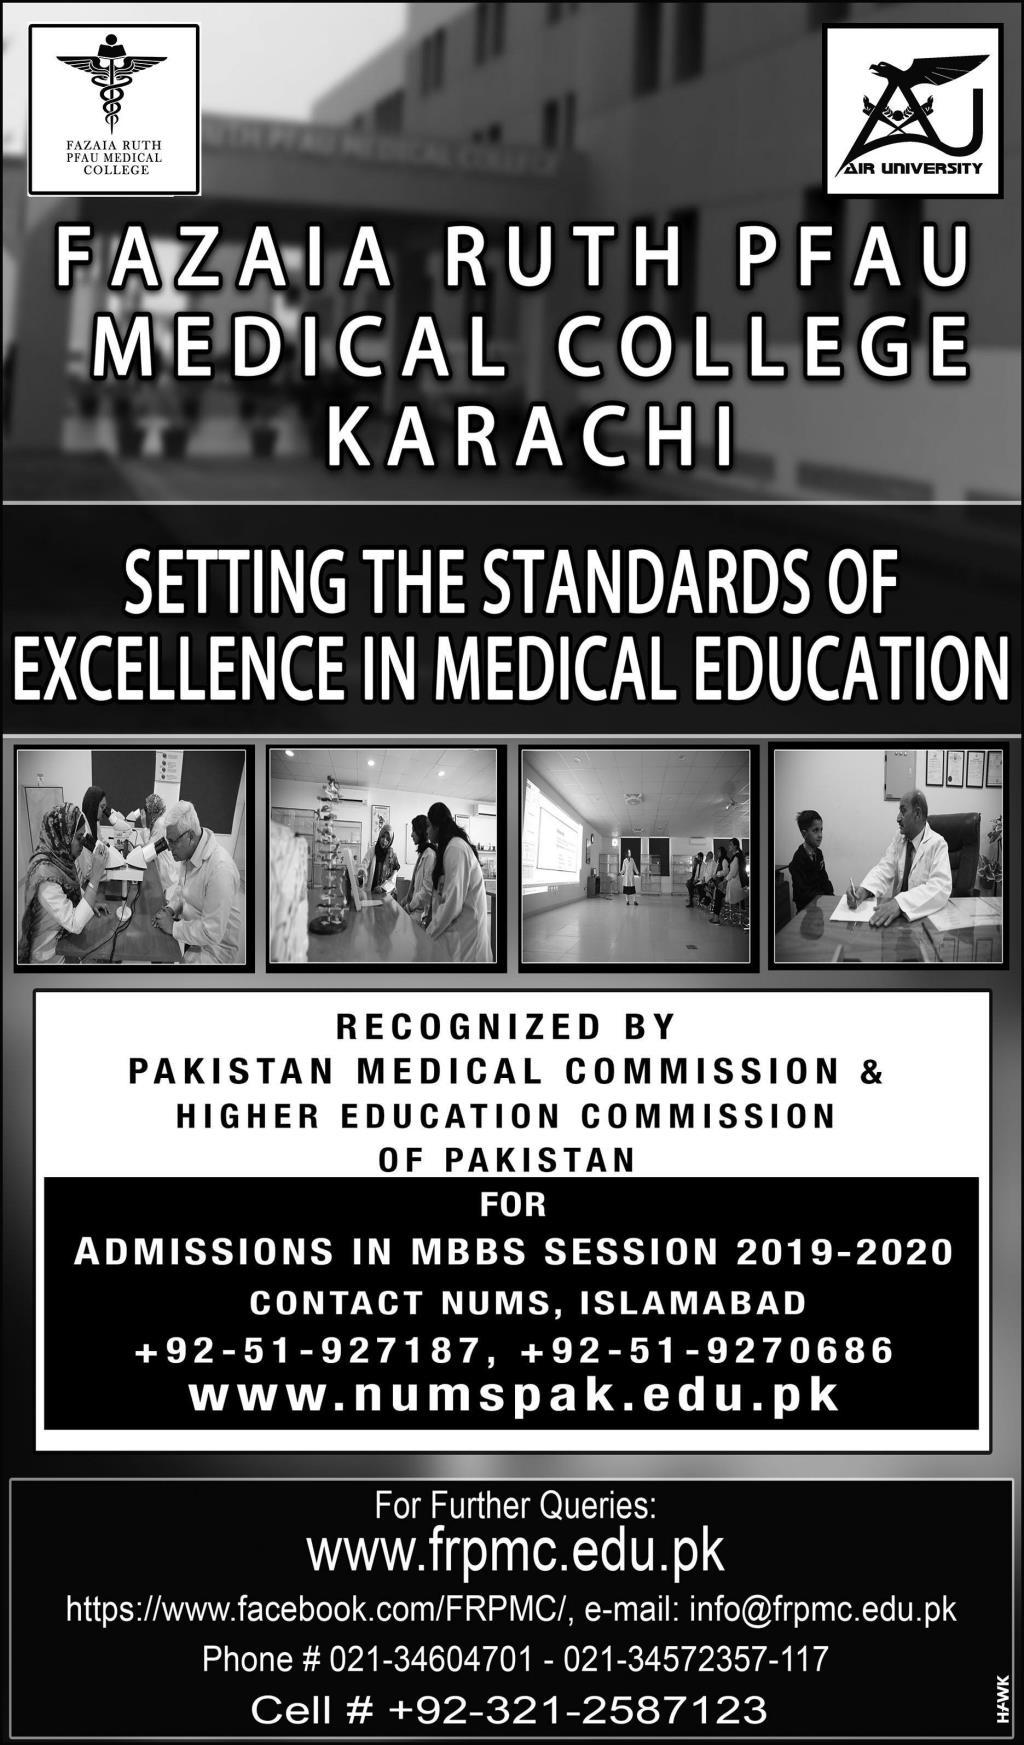 Fazaia Ruth Pfau Medical College Karachi Admissions